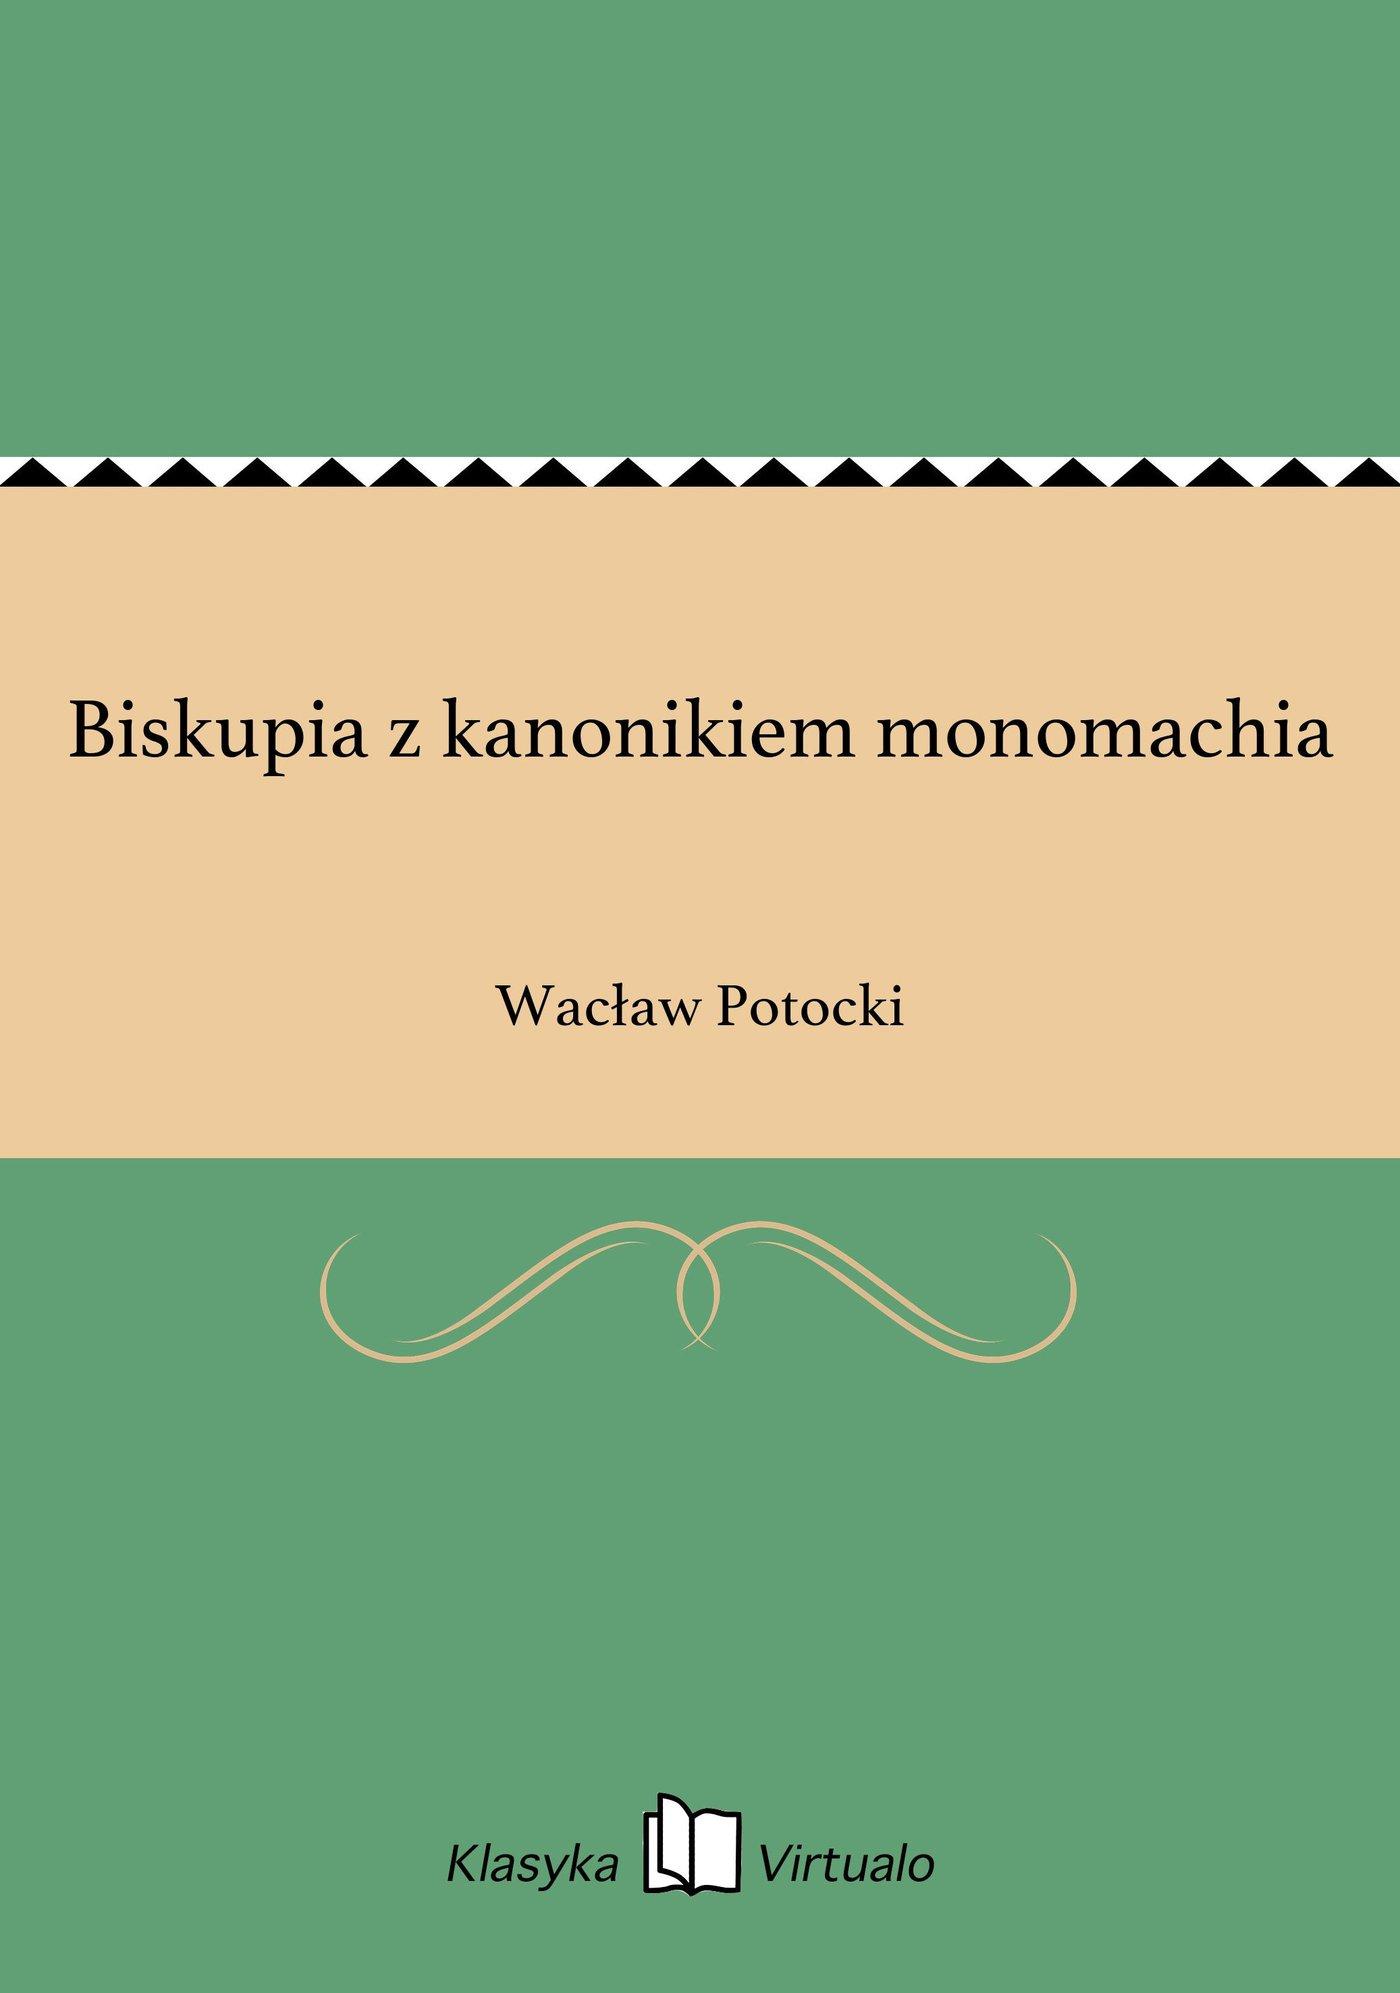 Biskupia z kanonikiem monomachia - Ebook (Książka na Kindle) do pobrania w formacie MOBI